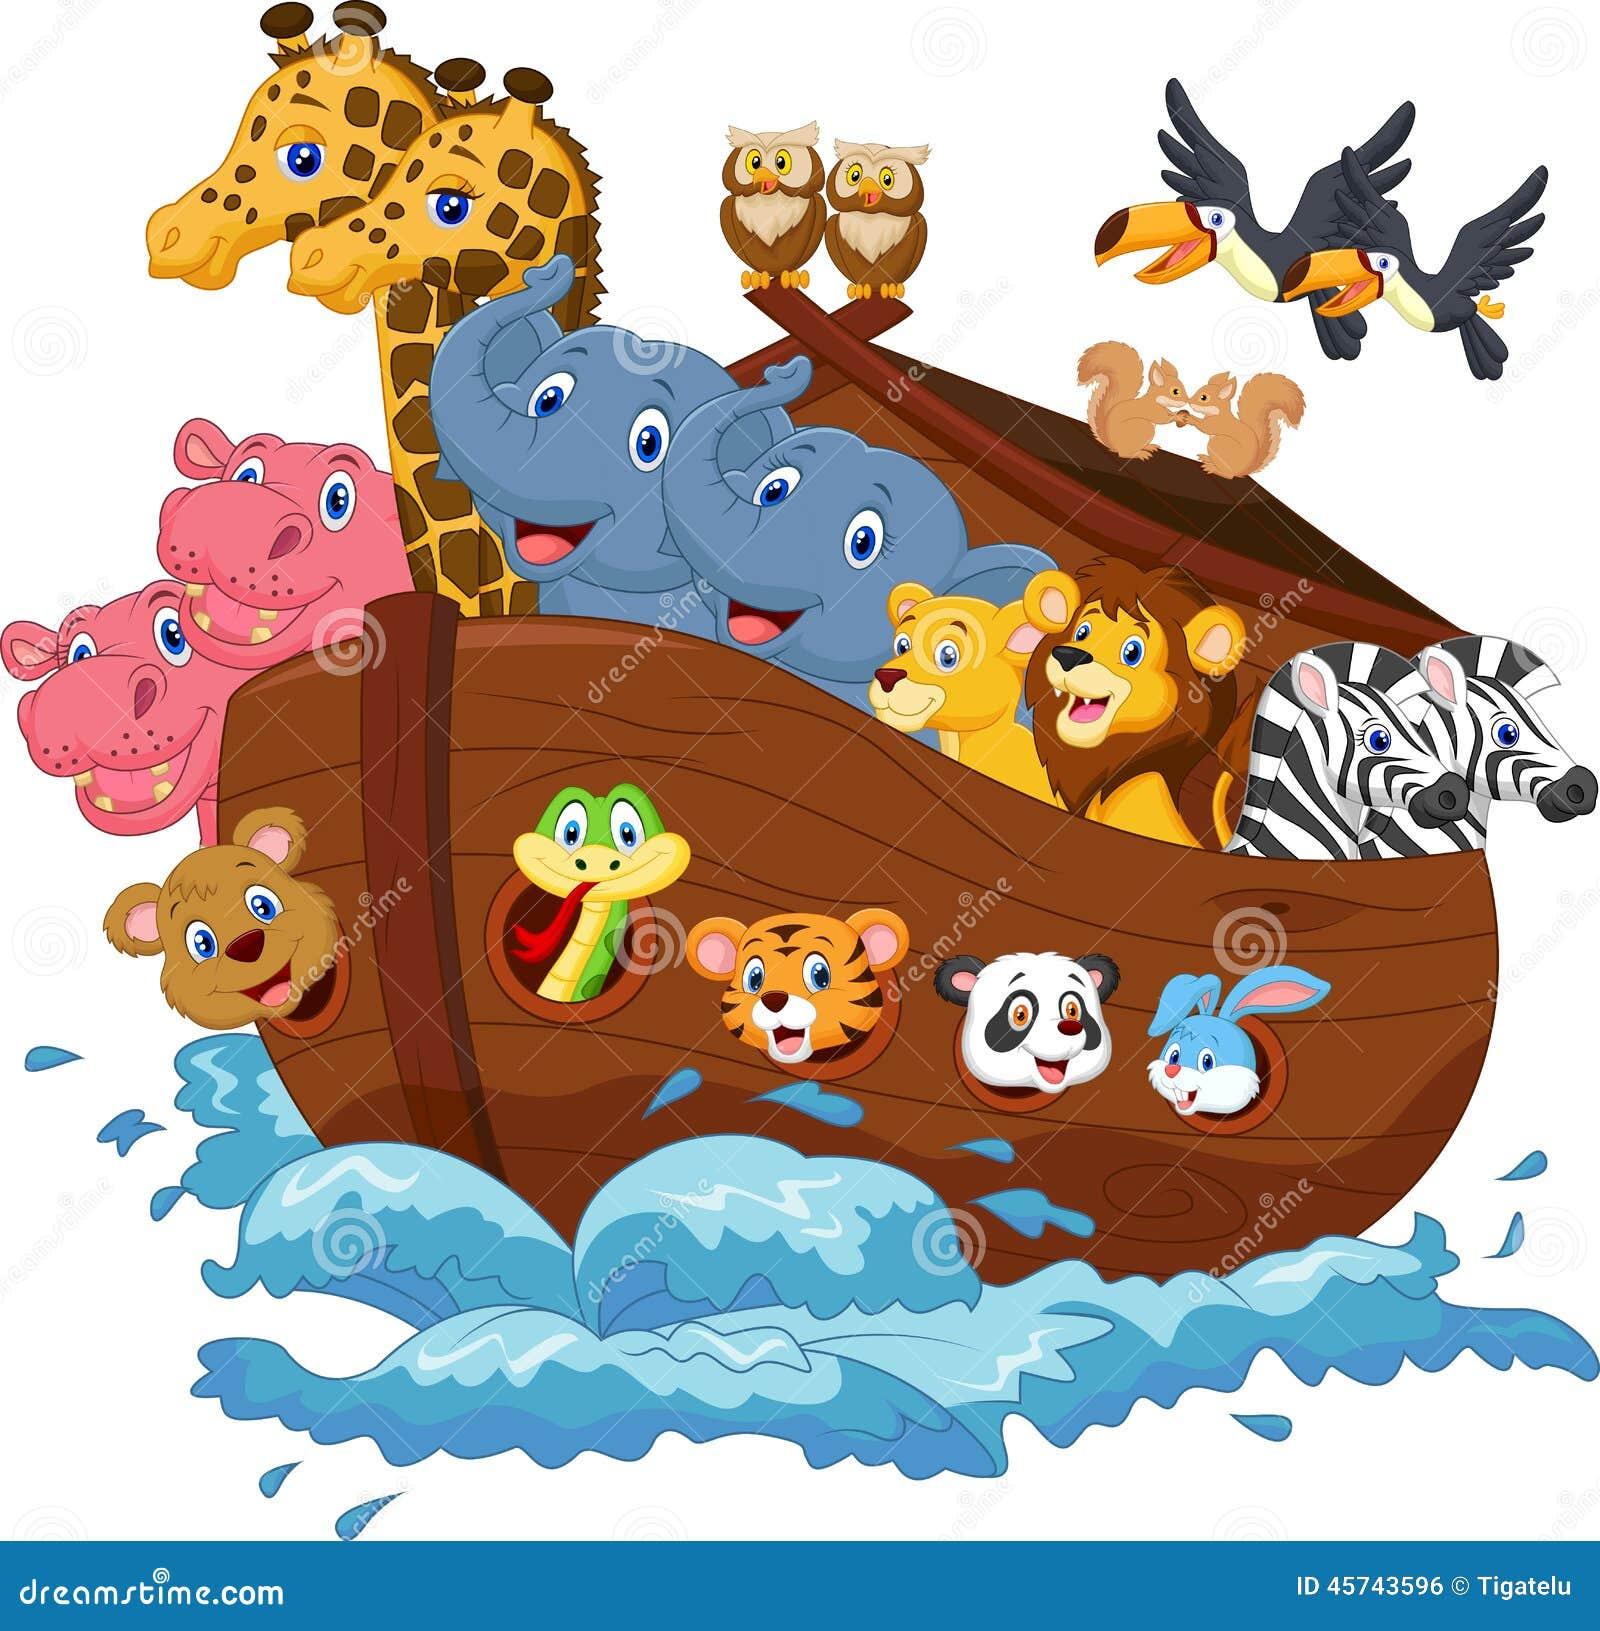 noahs ark cartoon stock vector image 45743596